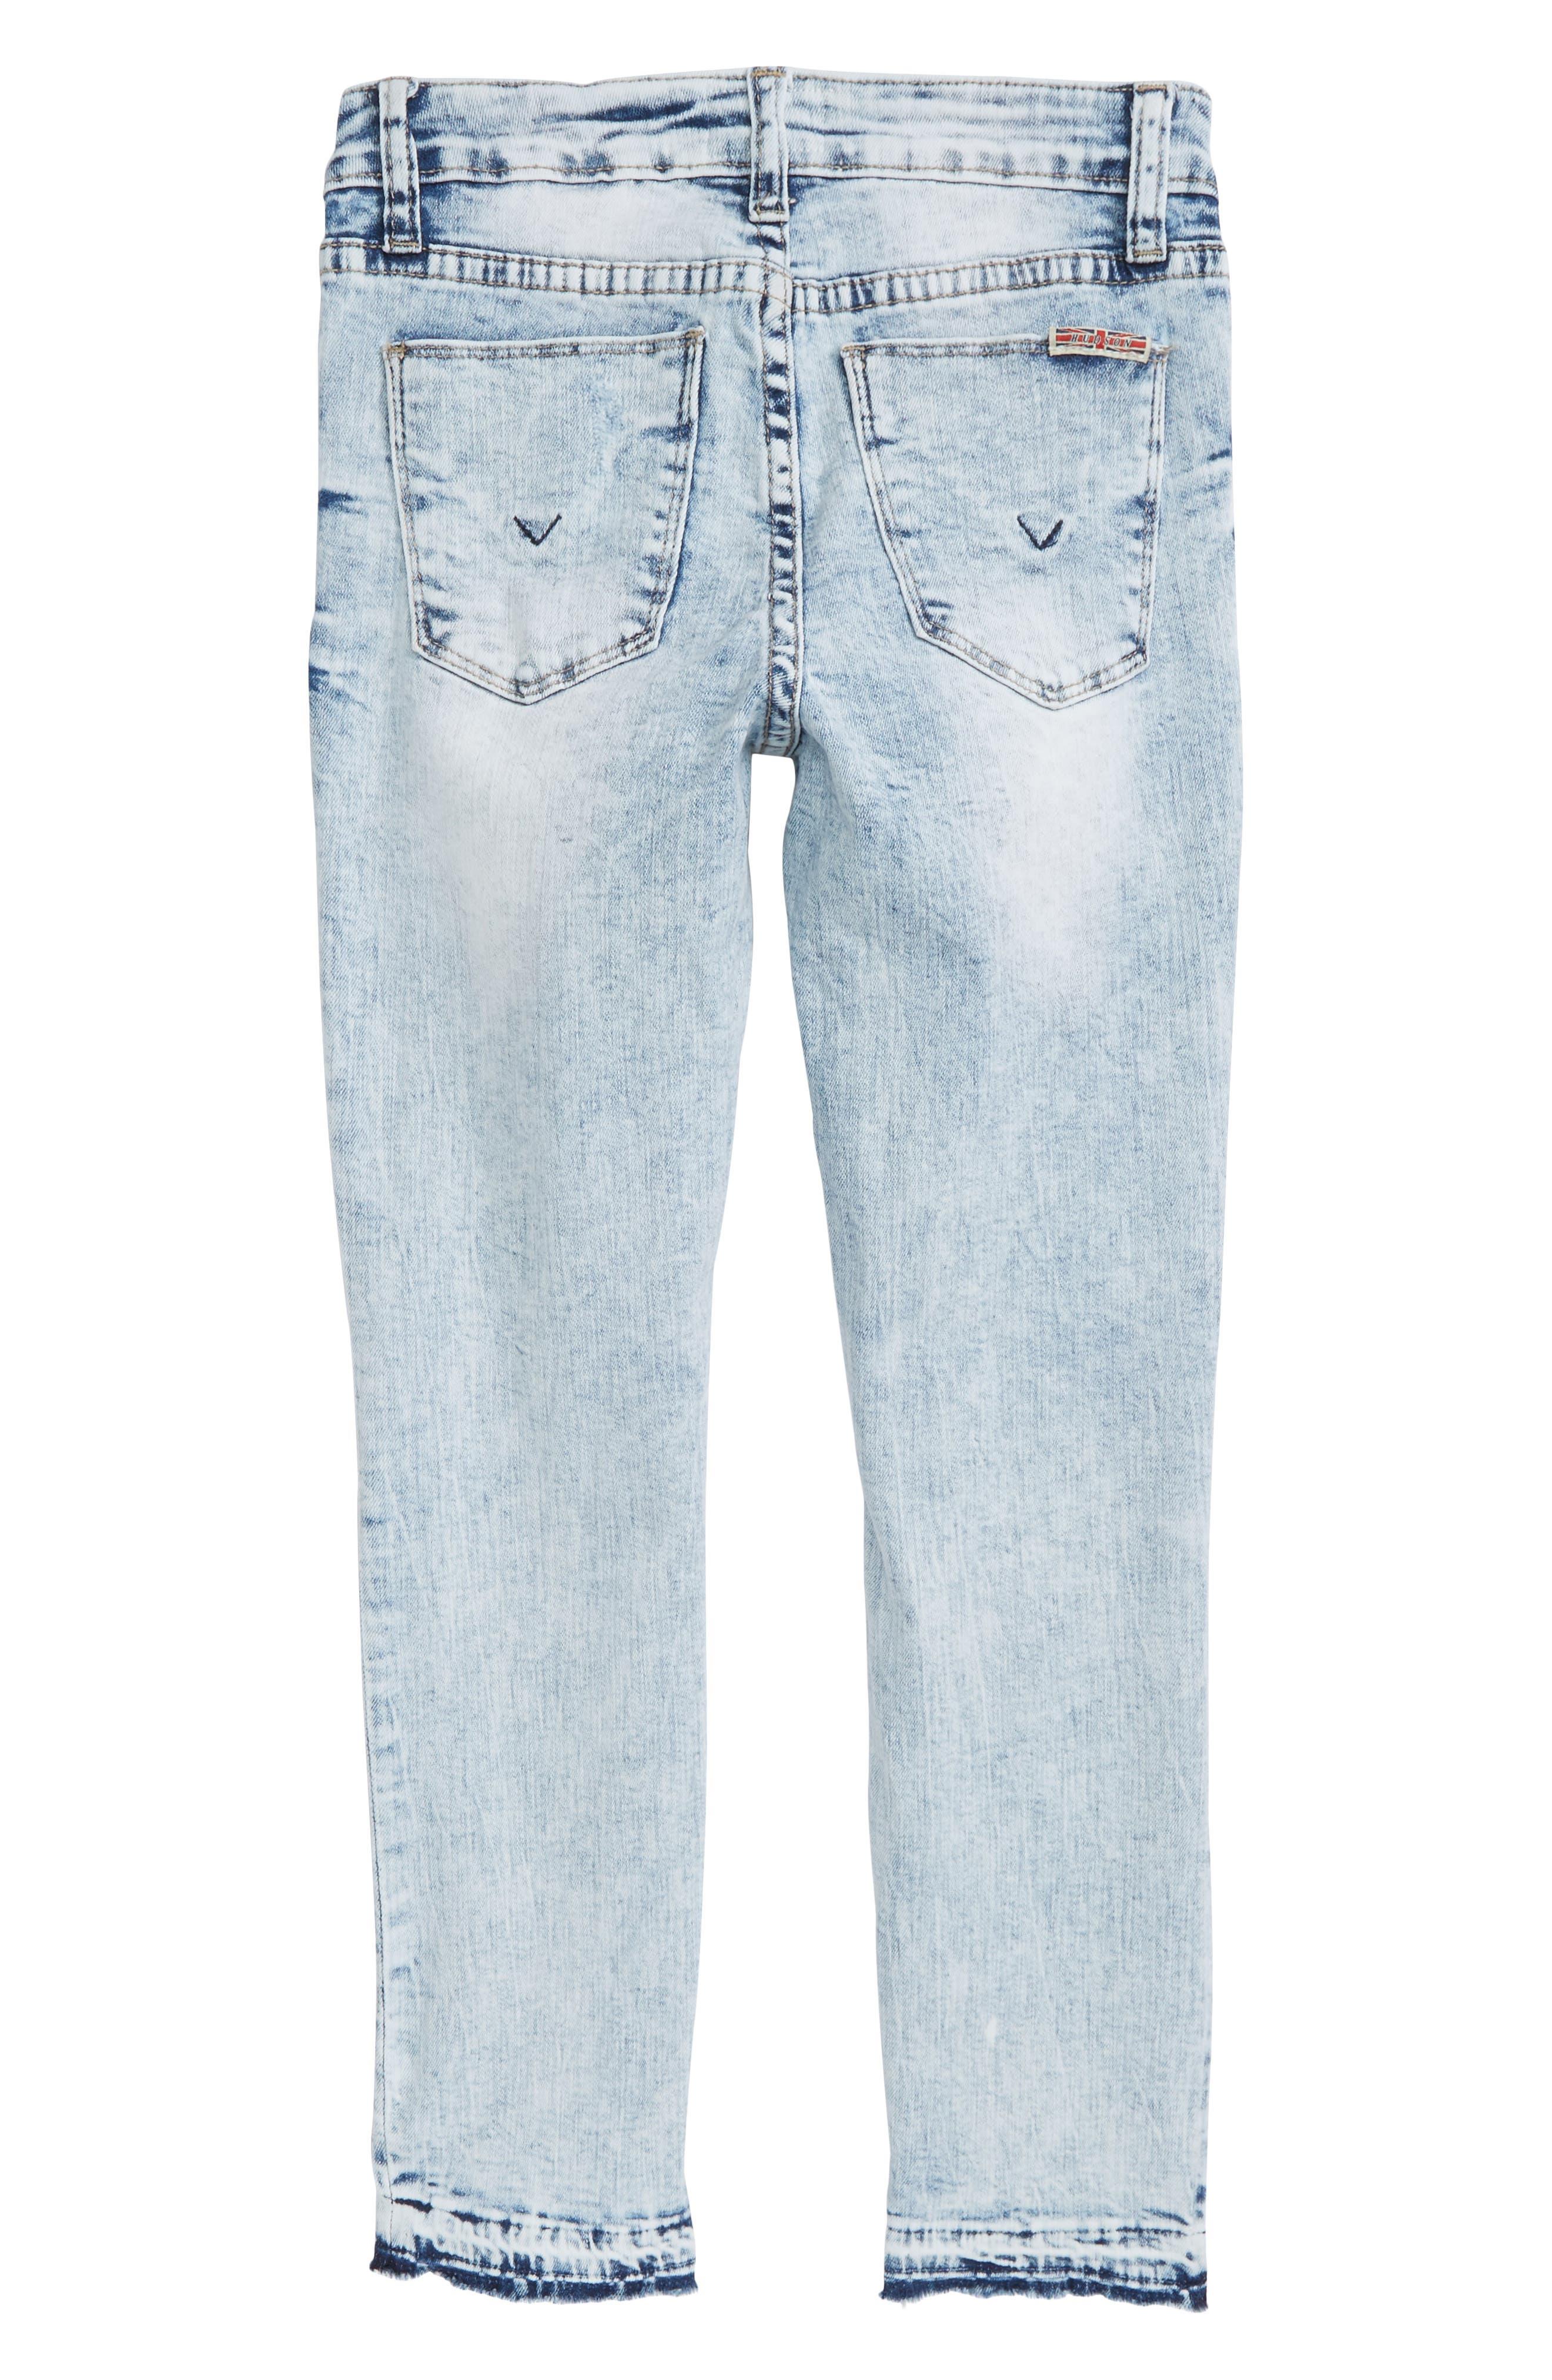 Vicky Crop Skinny Jeans,                             Alternate thumbnail 2, color,                             Iceberg Wash